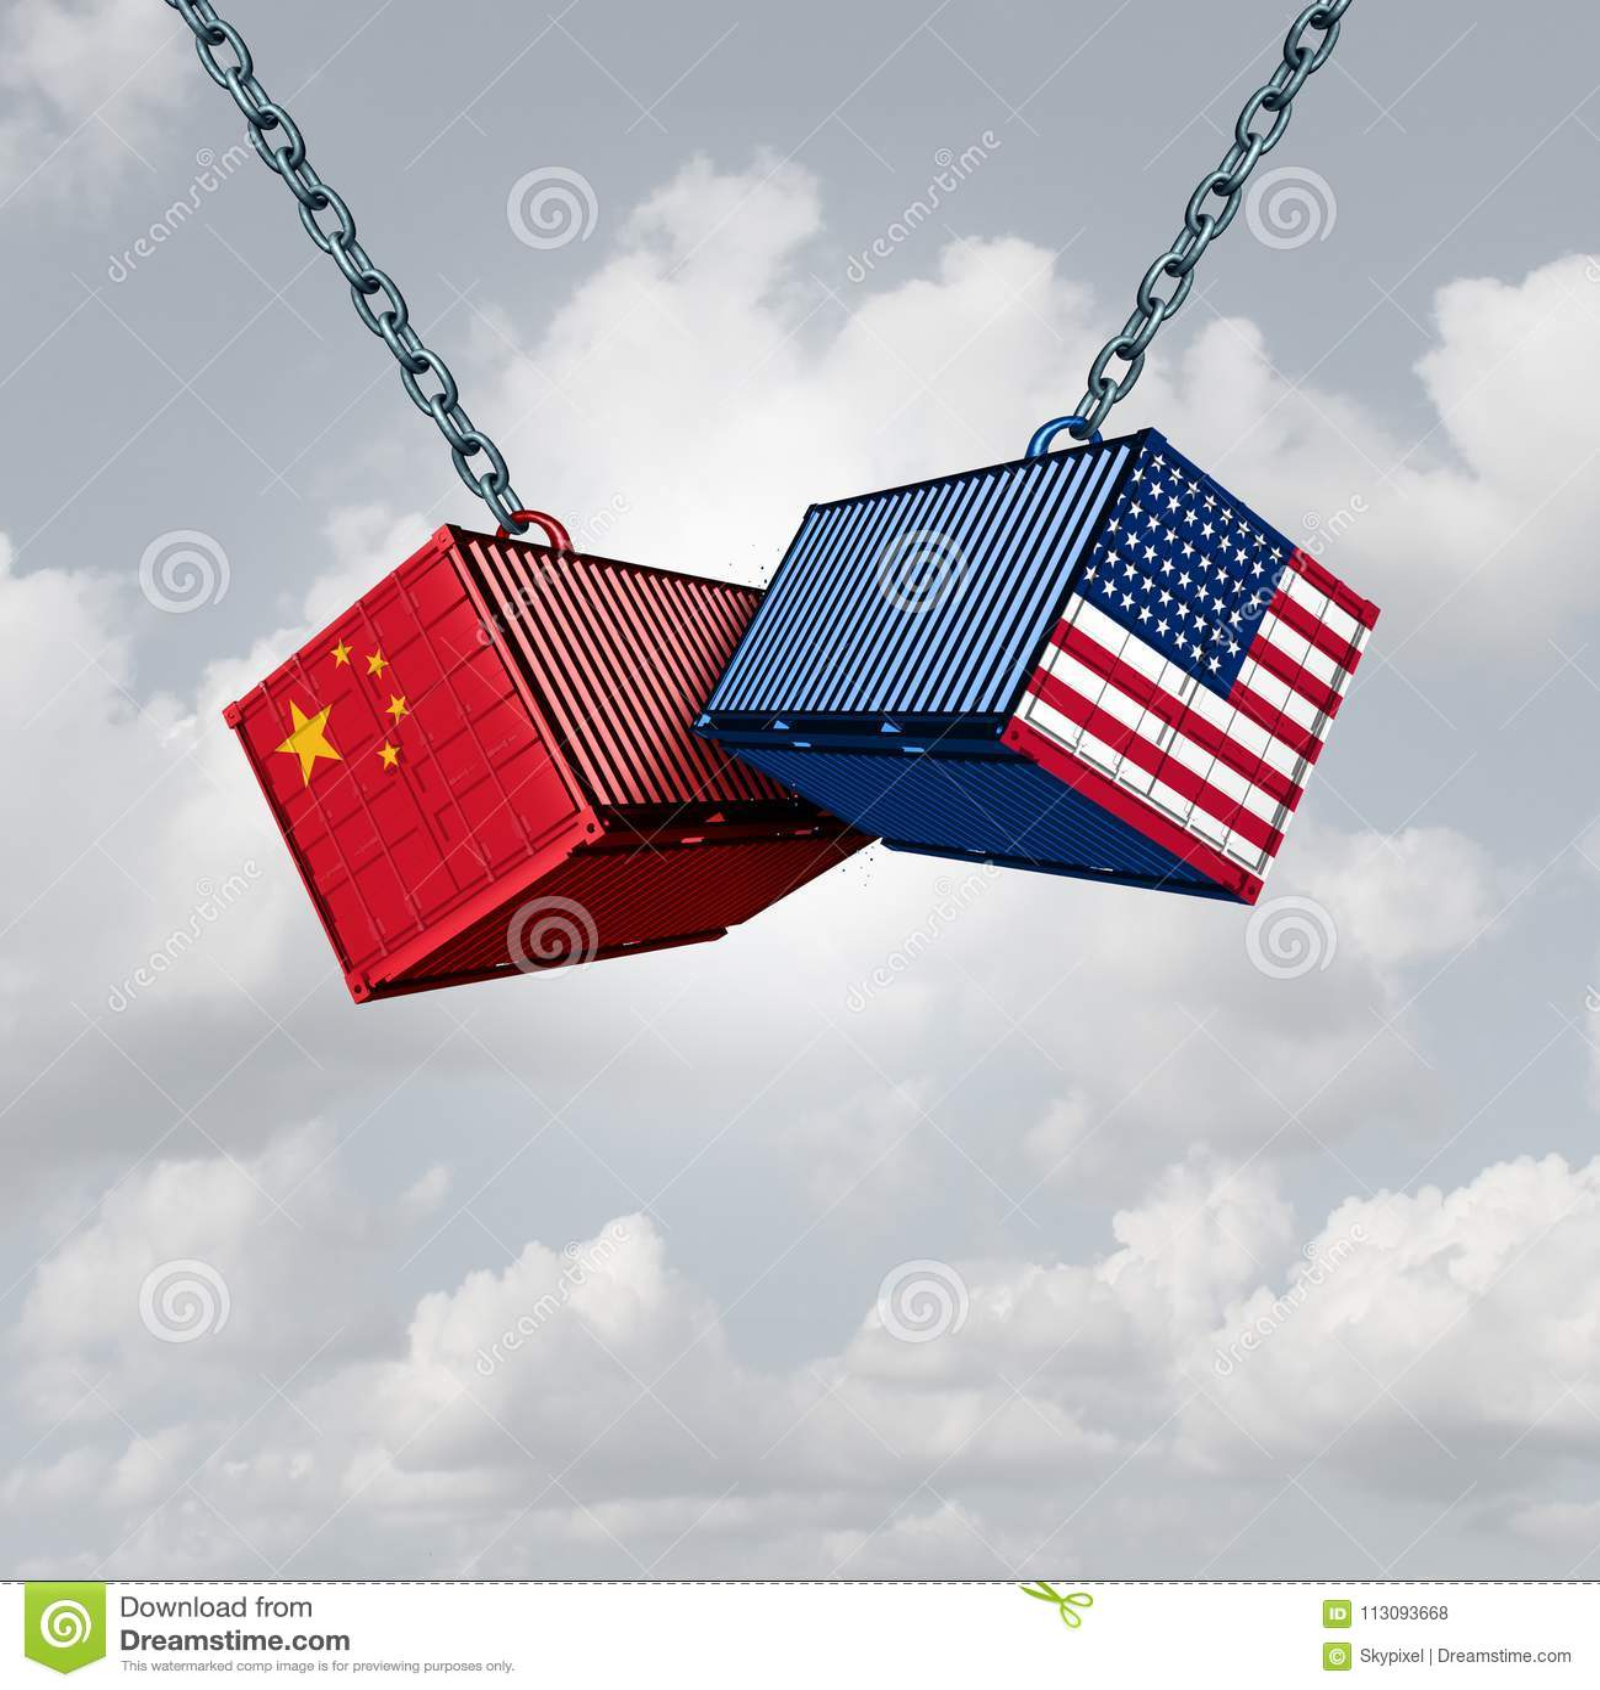 trade cartoons  illustrations  u0026 vector stock images